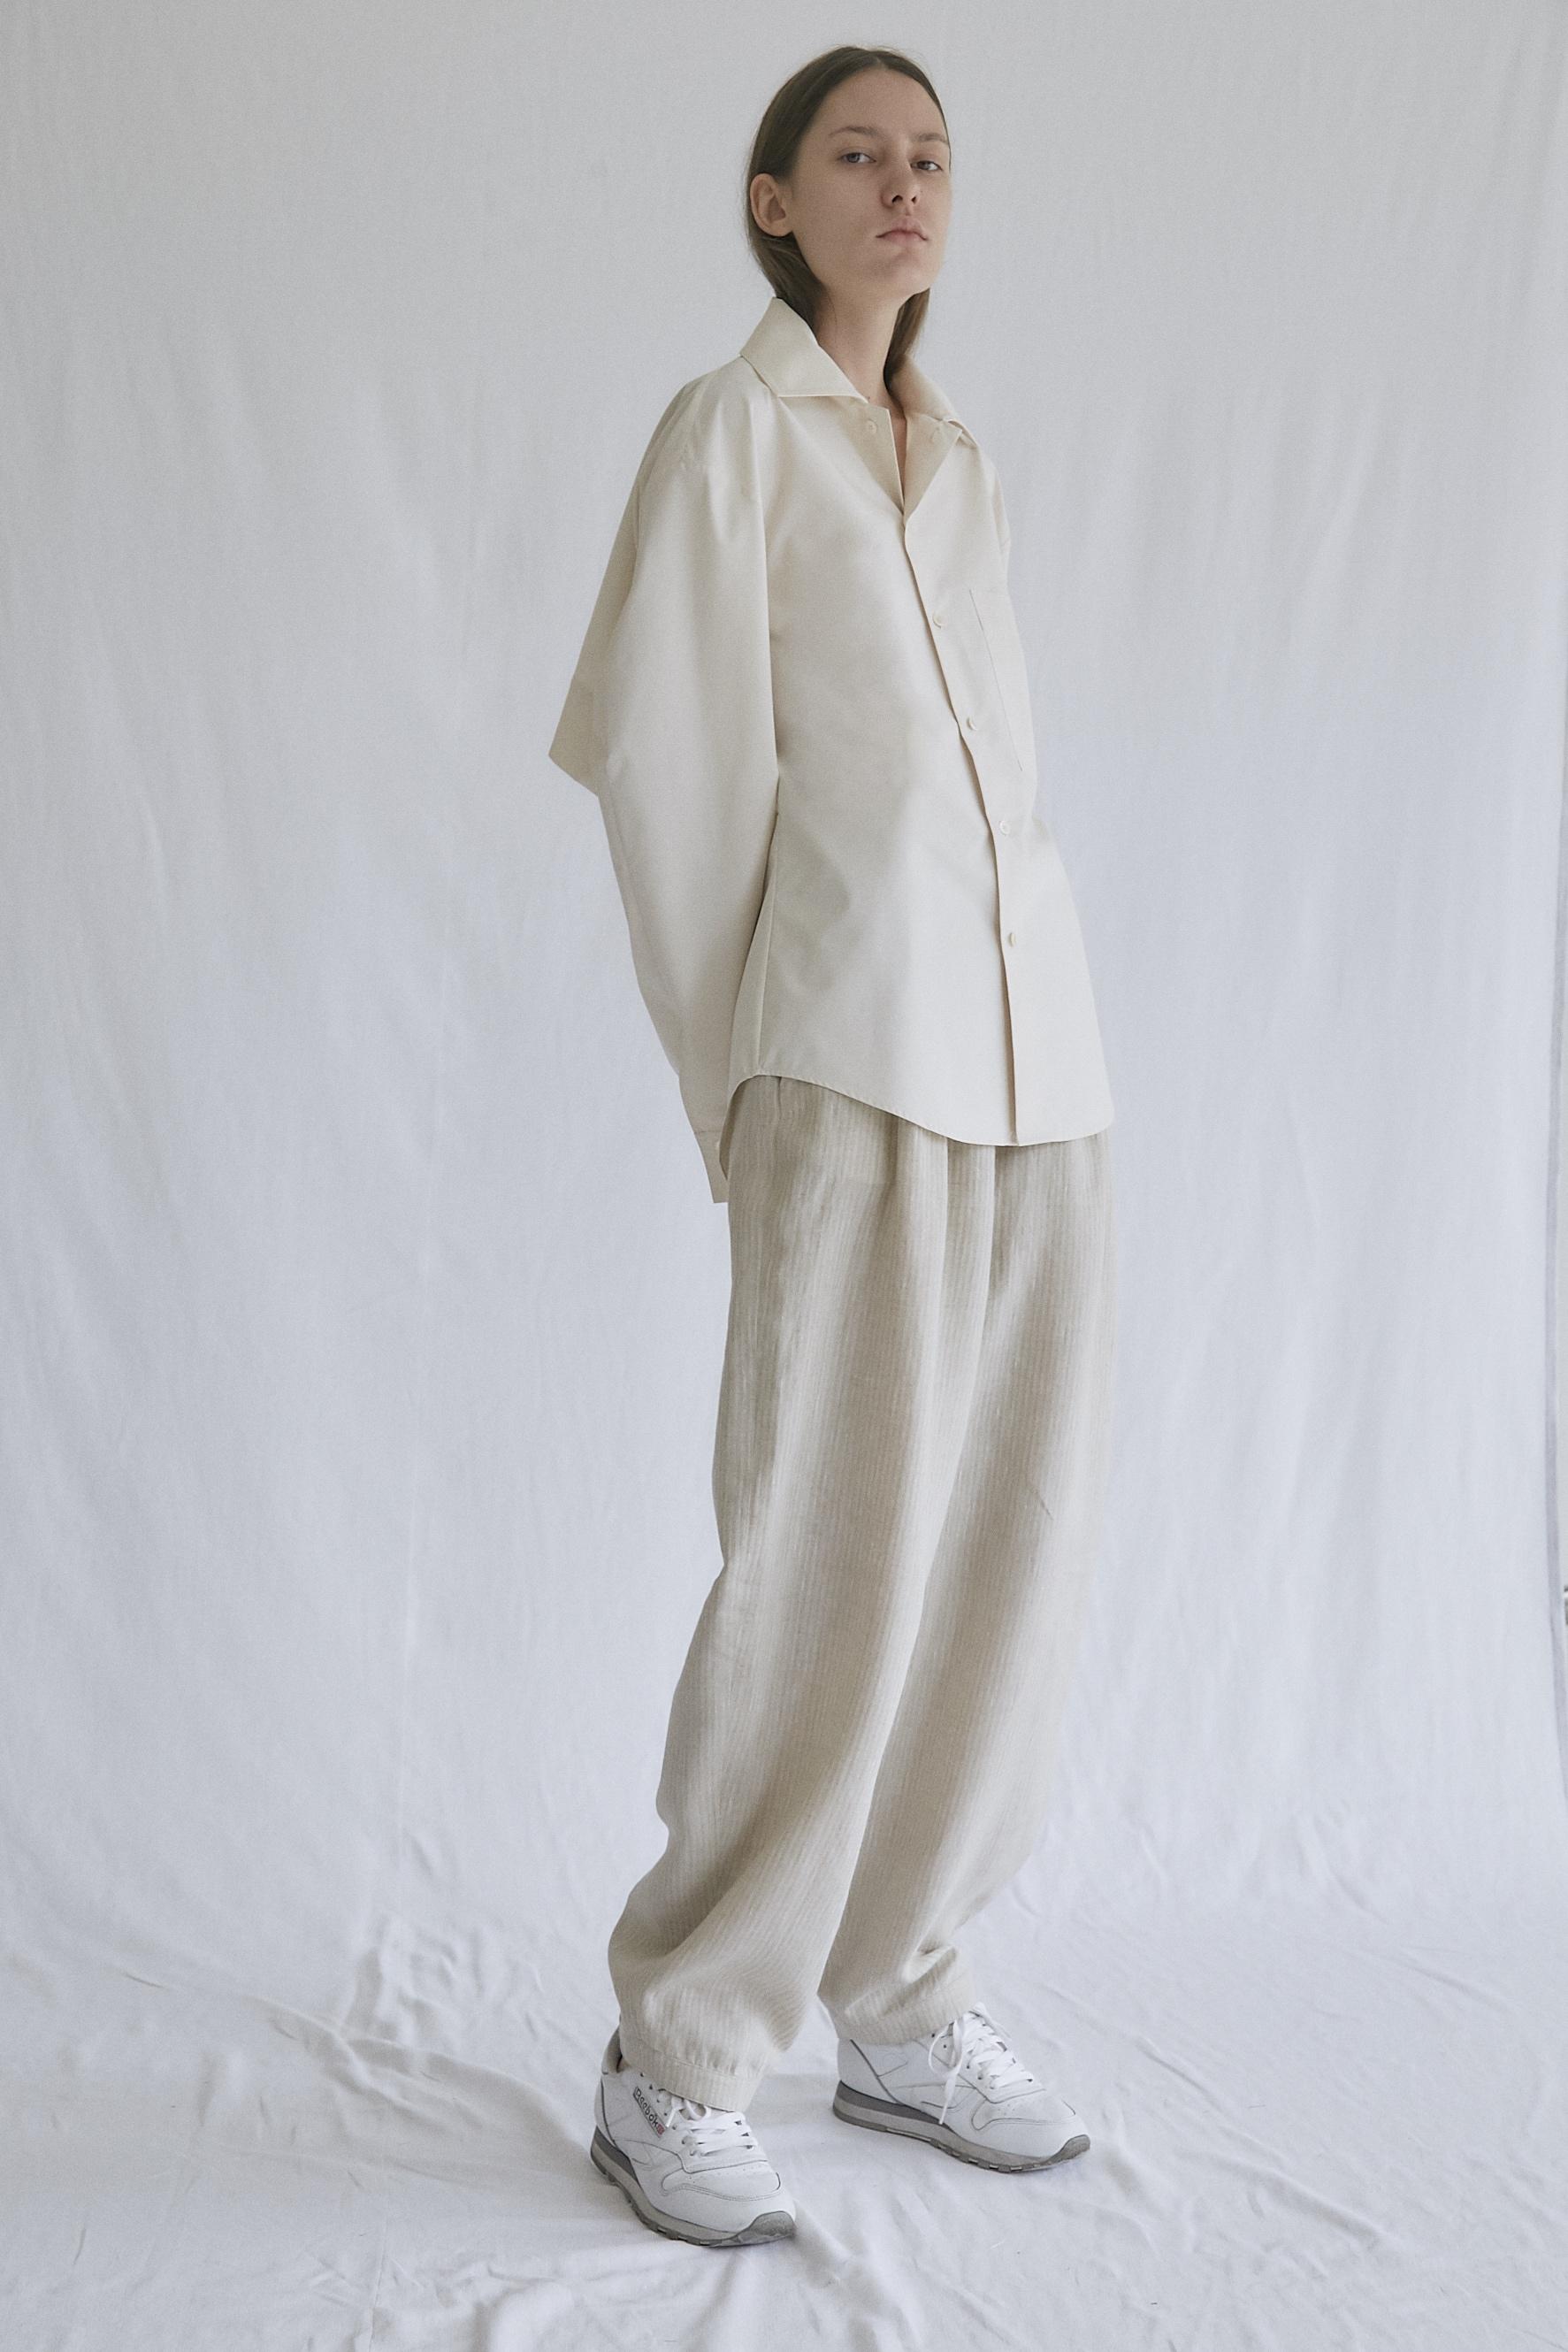 OSKAR   slash—back shirt in powder and   MIRO   gathered—waist trousers